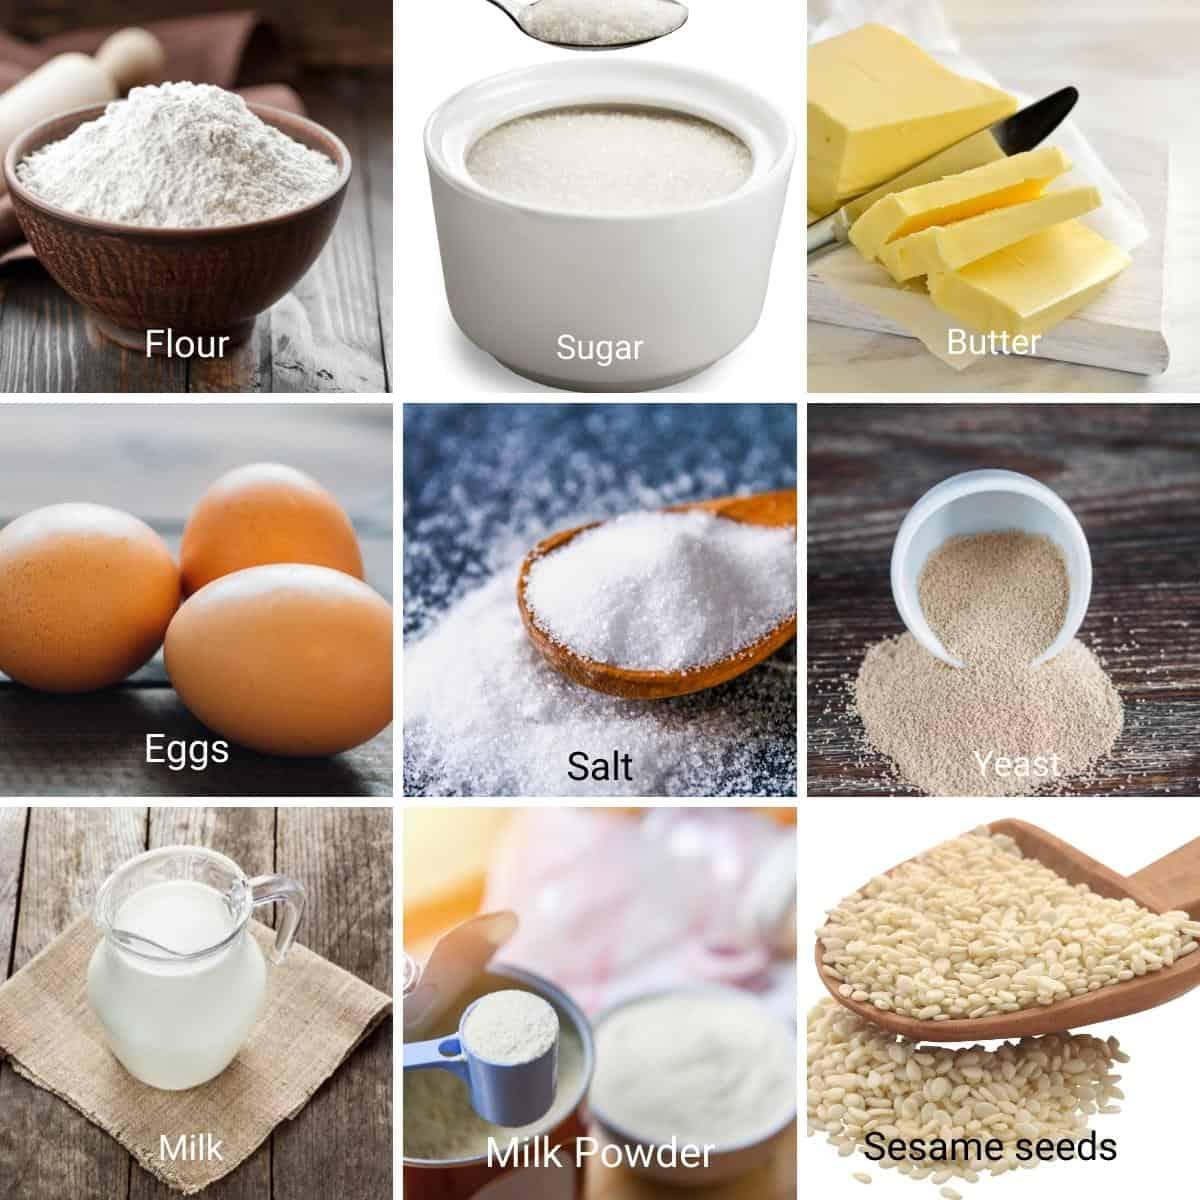 Ingredients shot collage for Japanese Milk Bread.